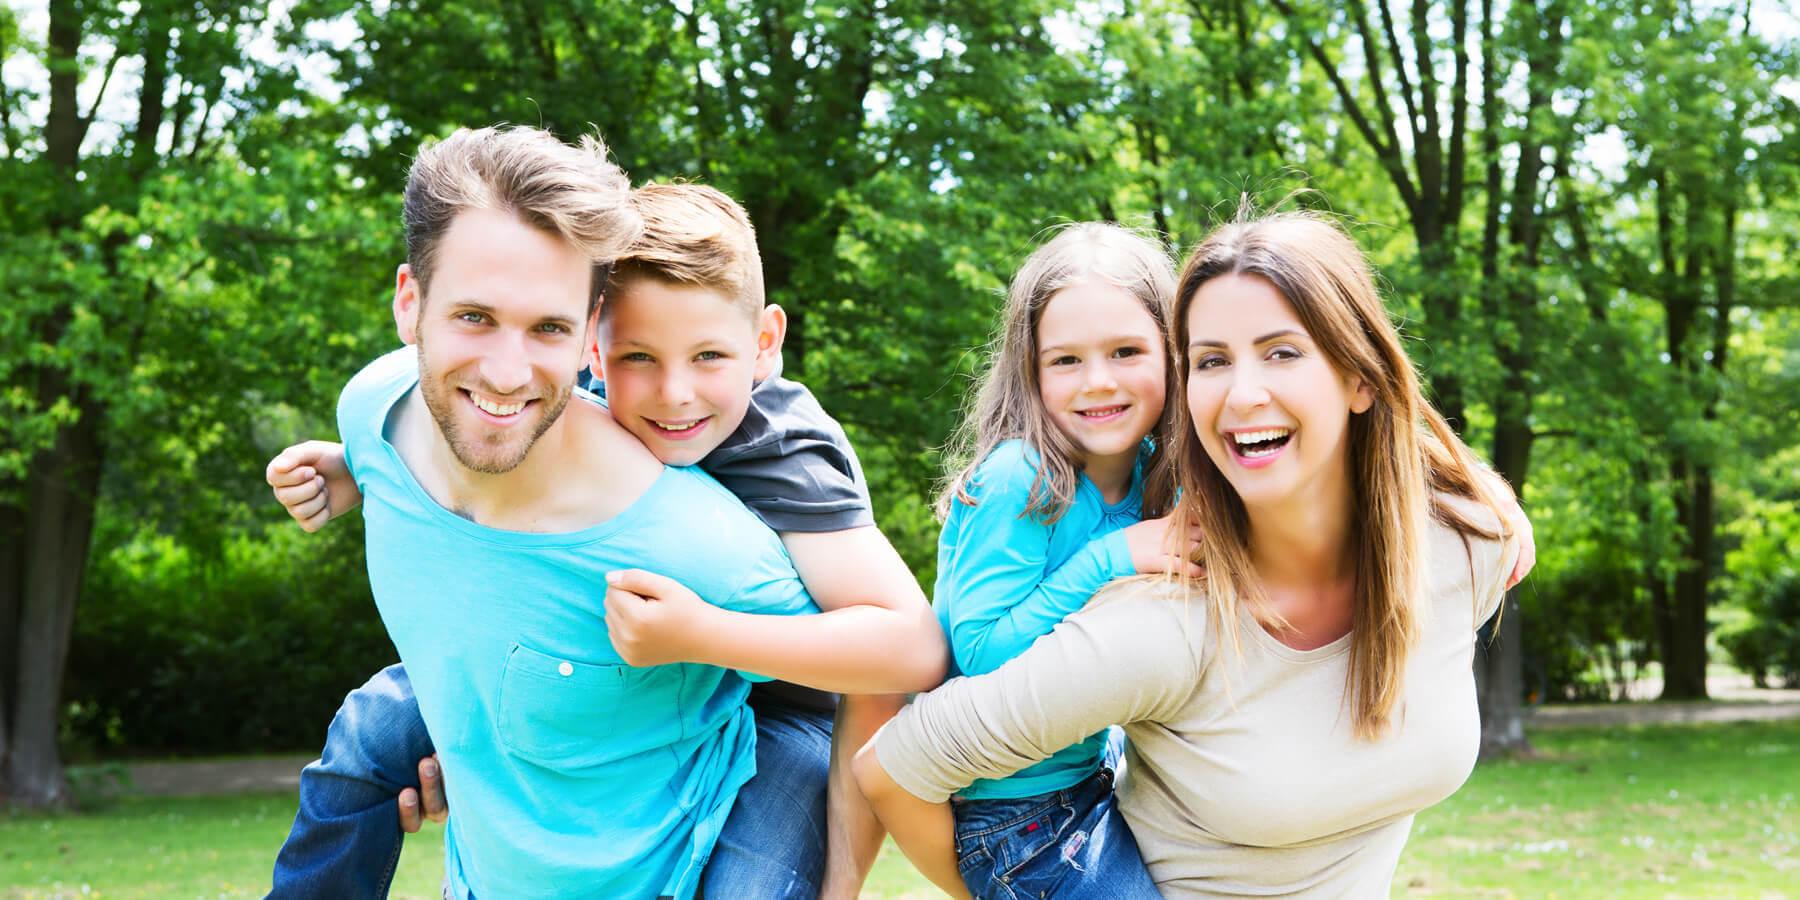 Plano Odontológico Familiar